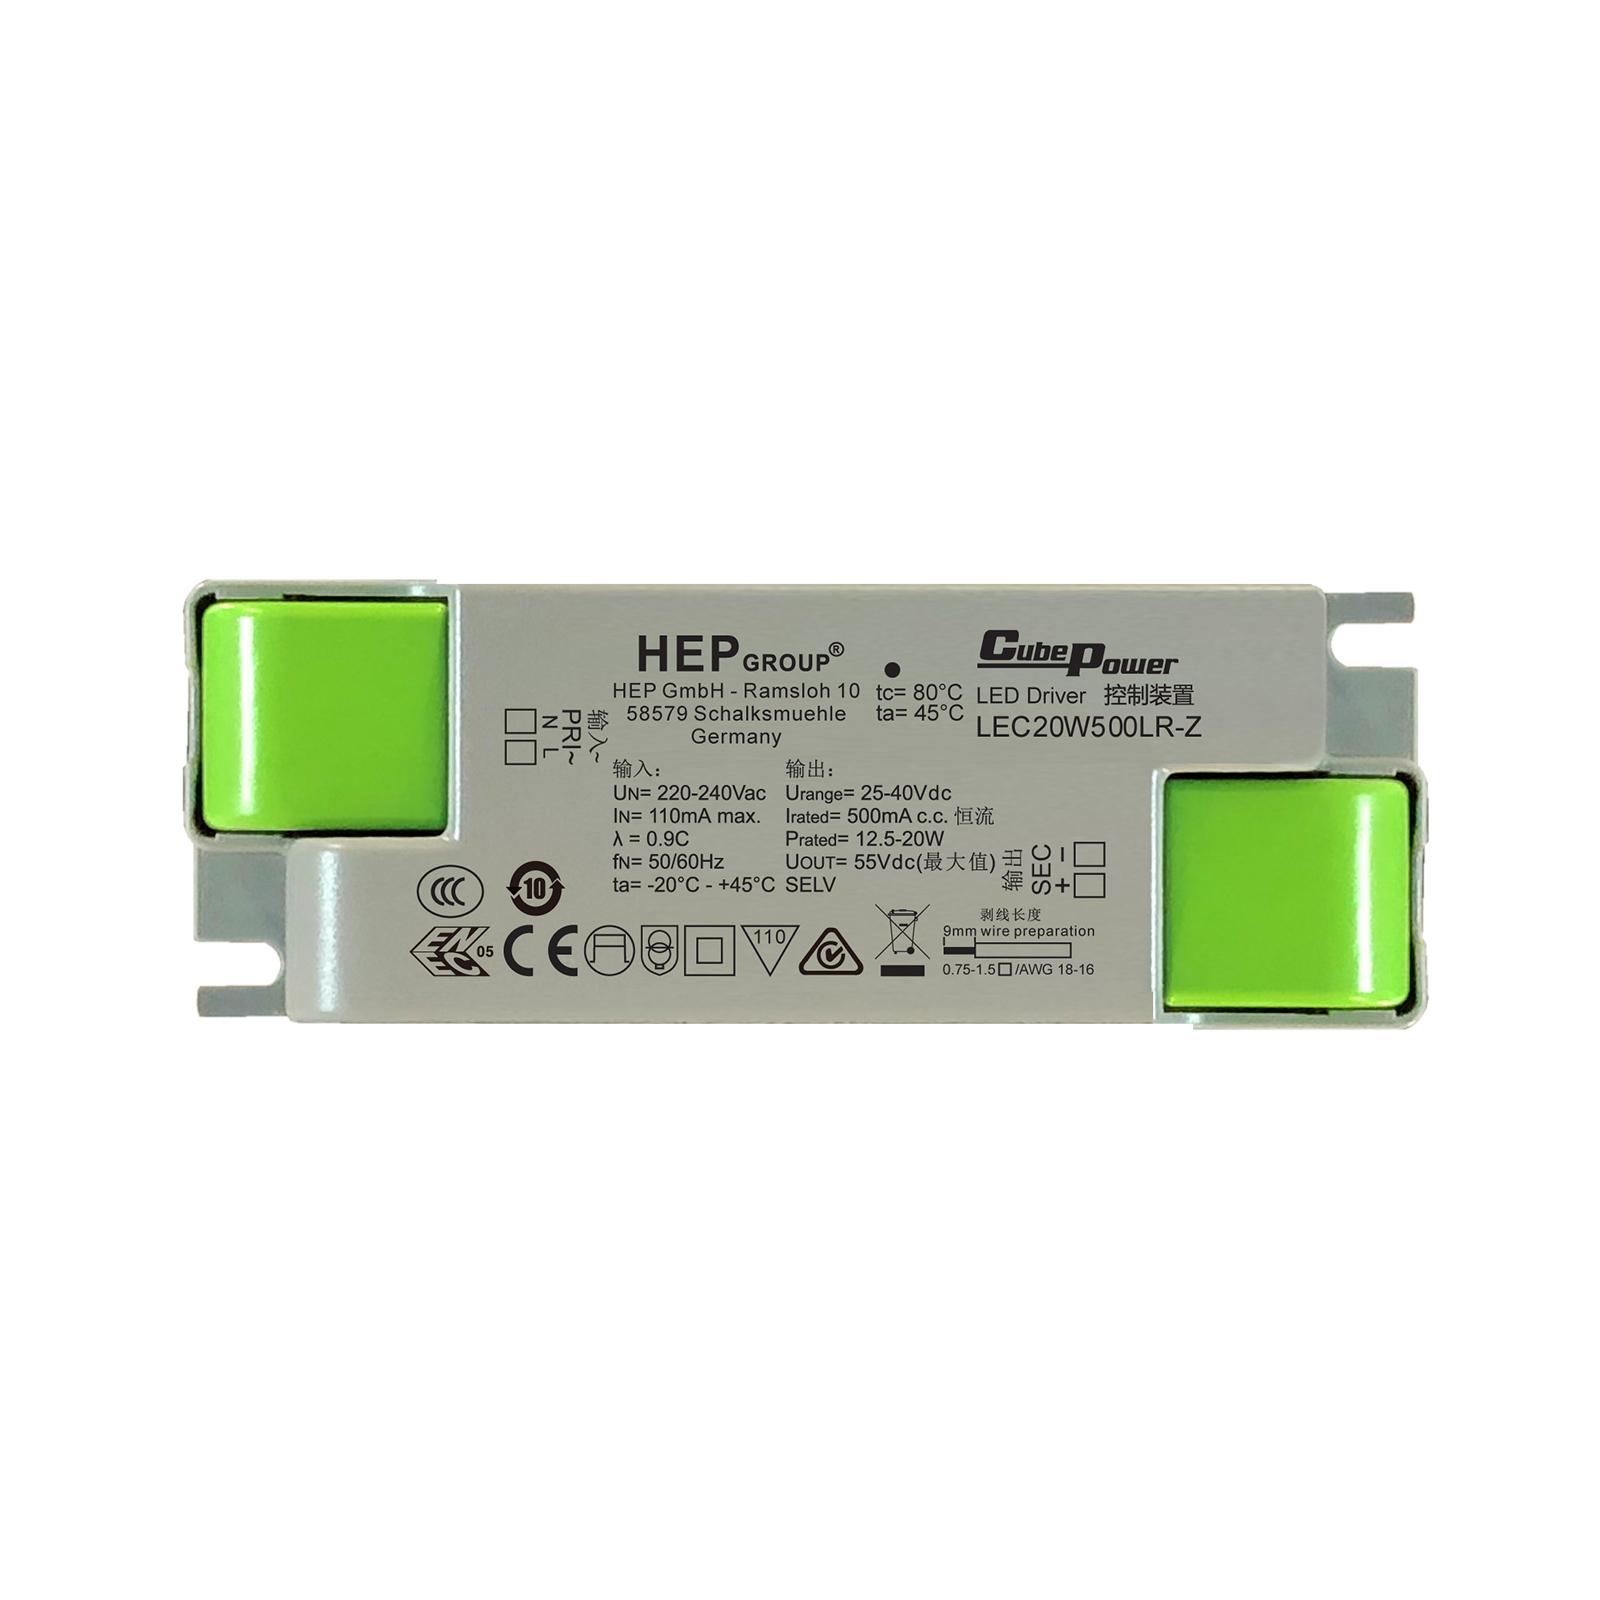 LED-driver LEC, 20 W, 500 mA, CC